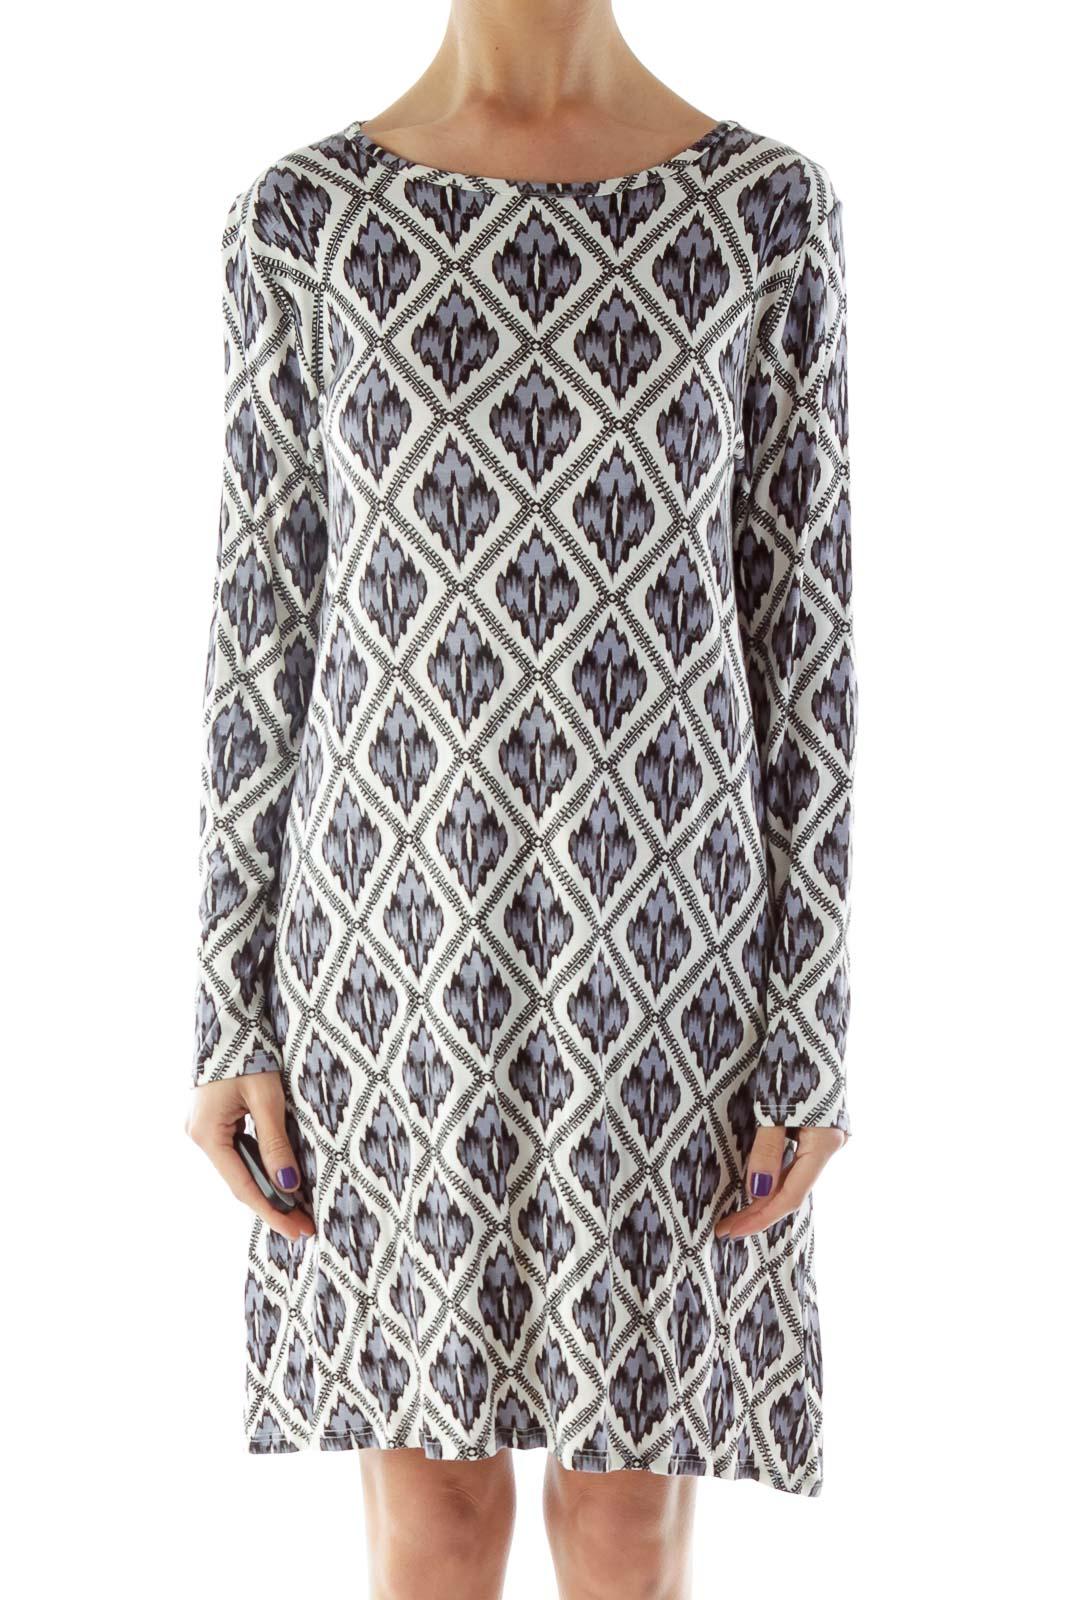 Blue Black White Printed Dress Front